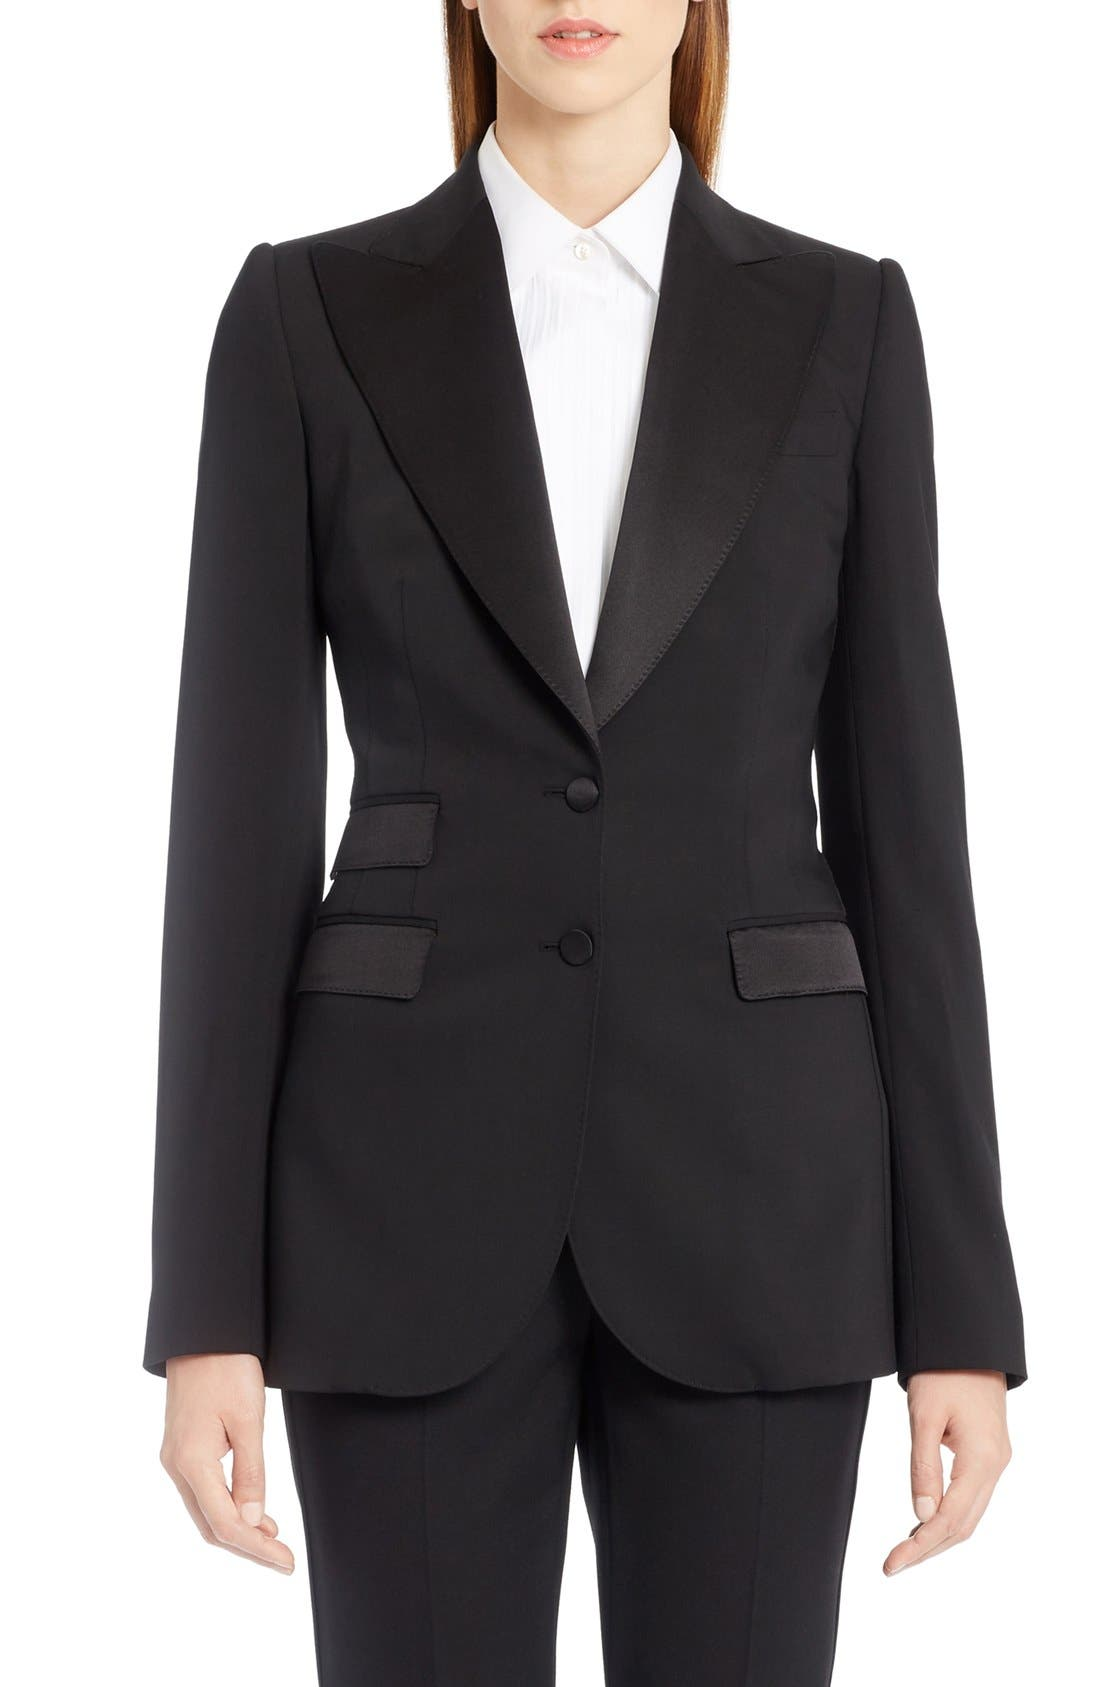 DOLCE&GABBANA Wool Blend Crepe Tuxedo Jacket